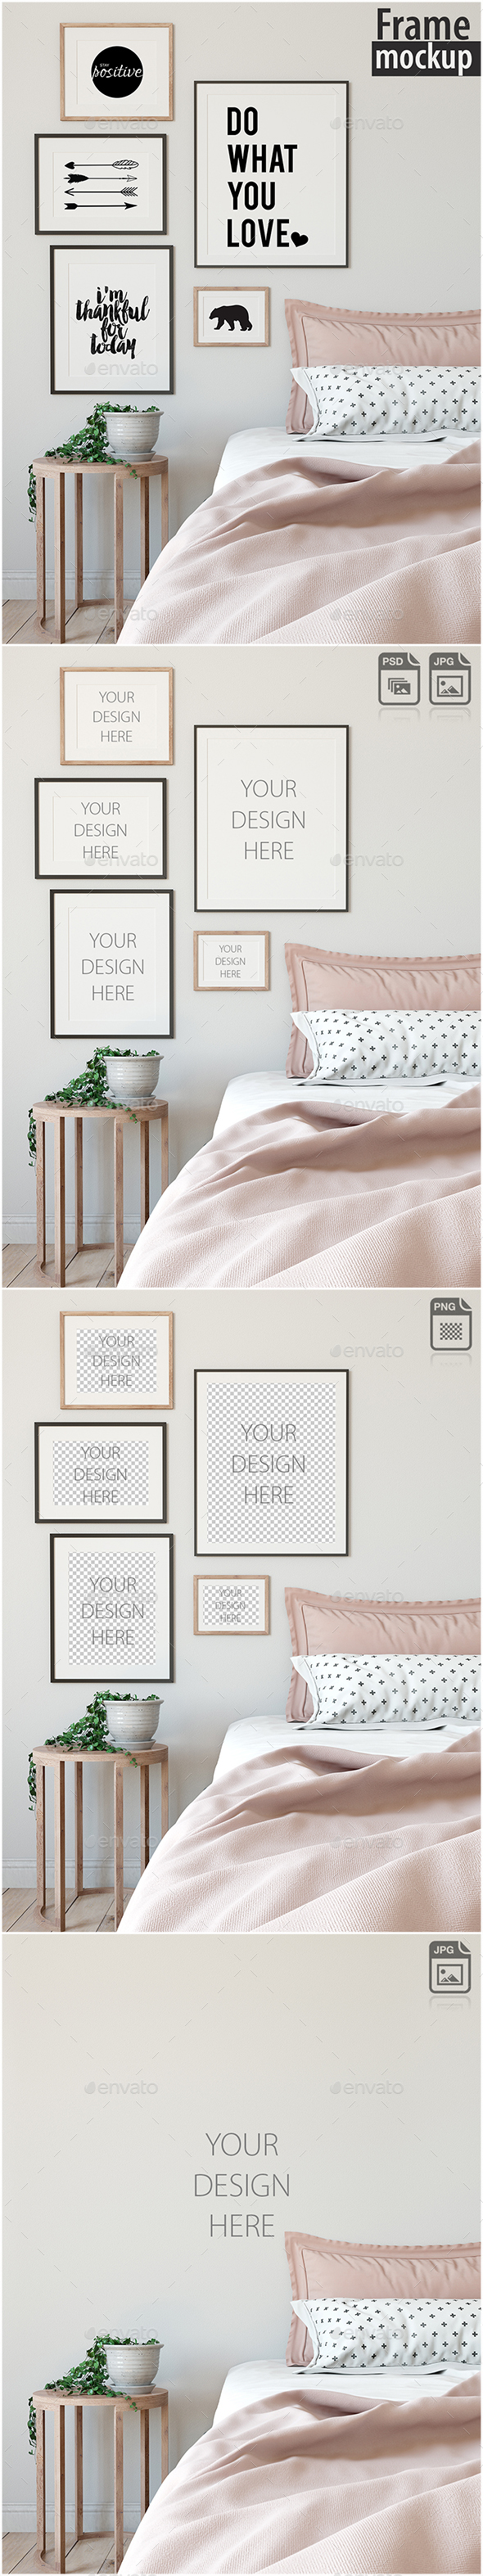 Frame Mockup_16 - Posters Print